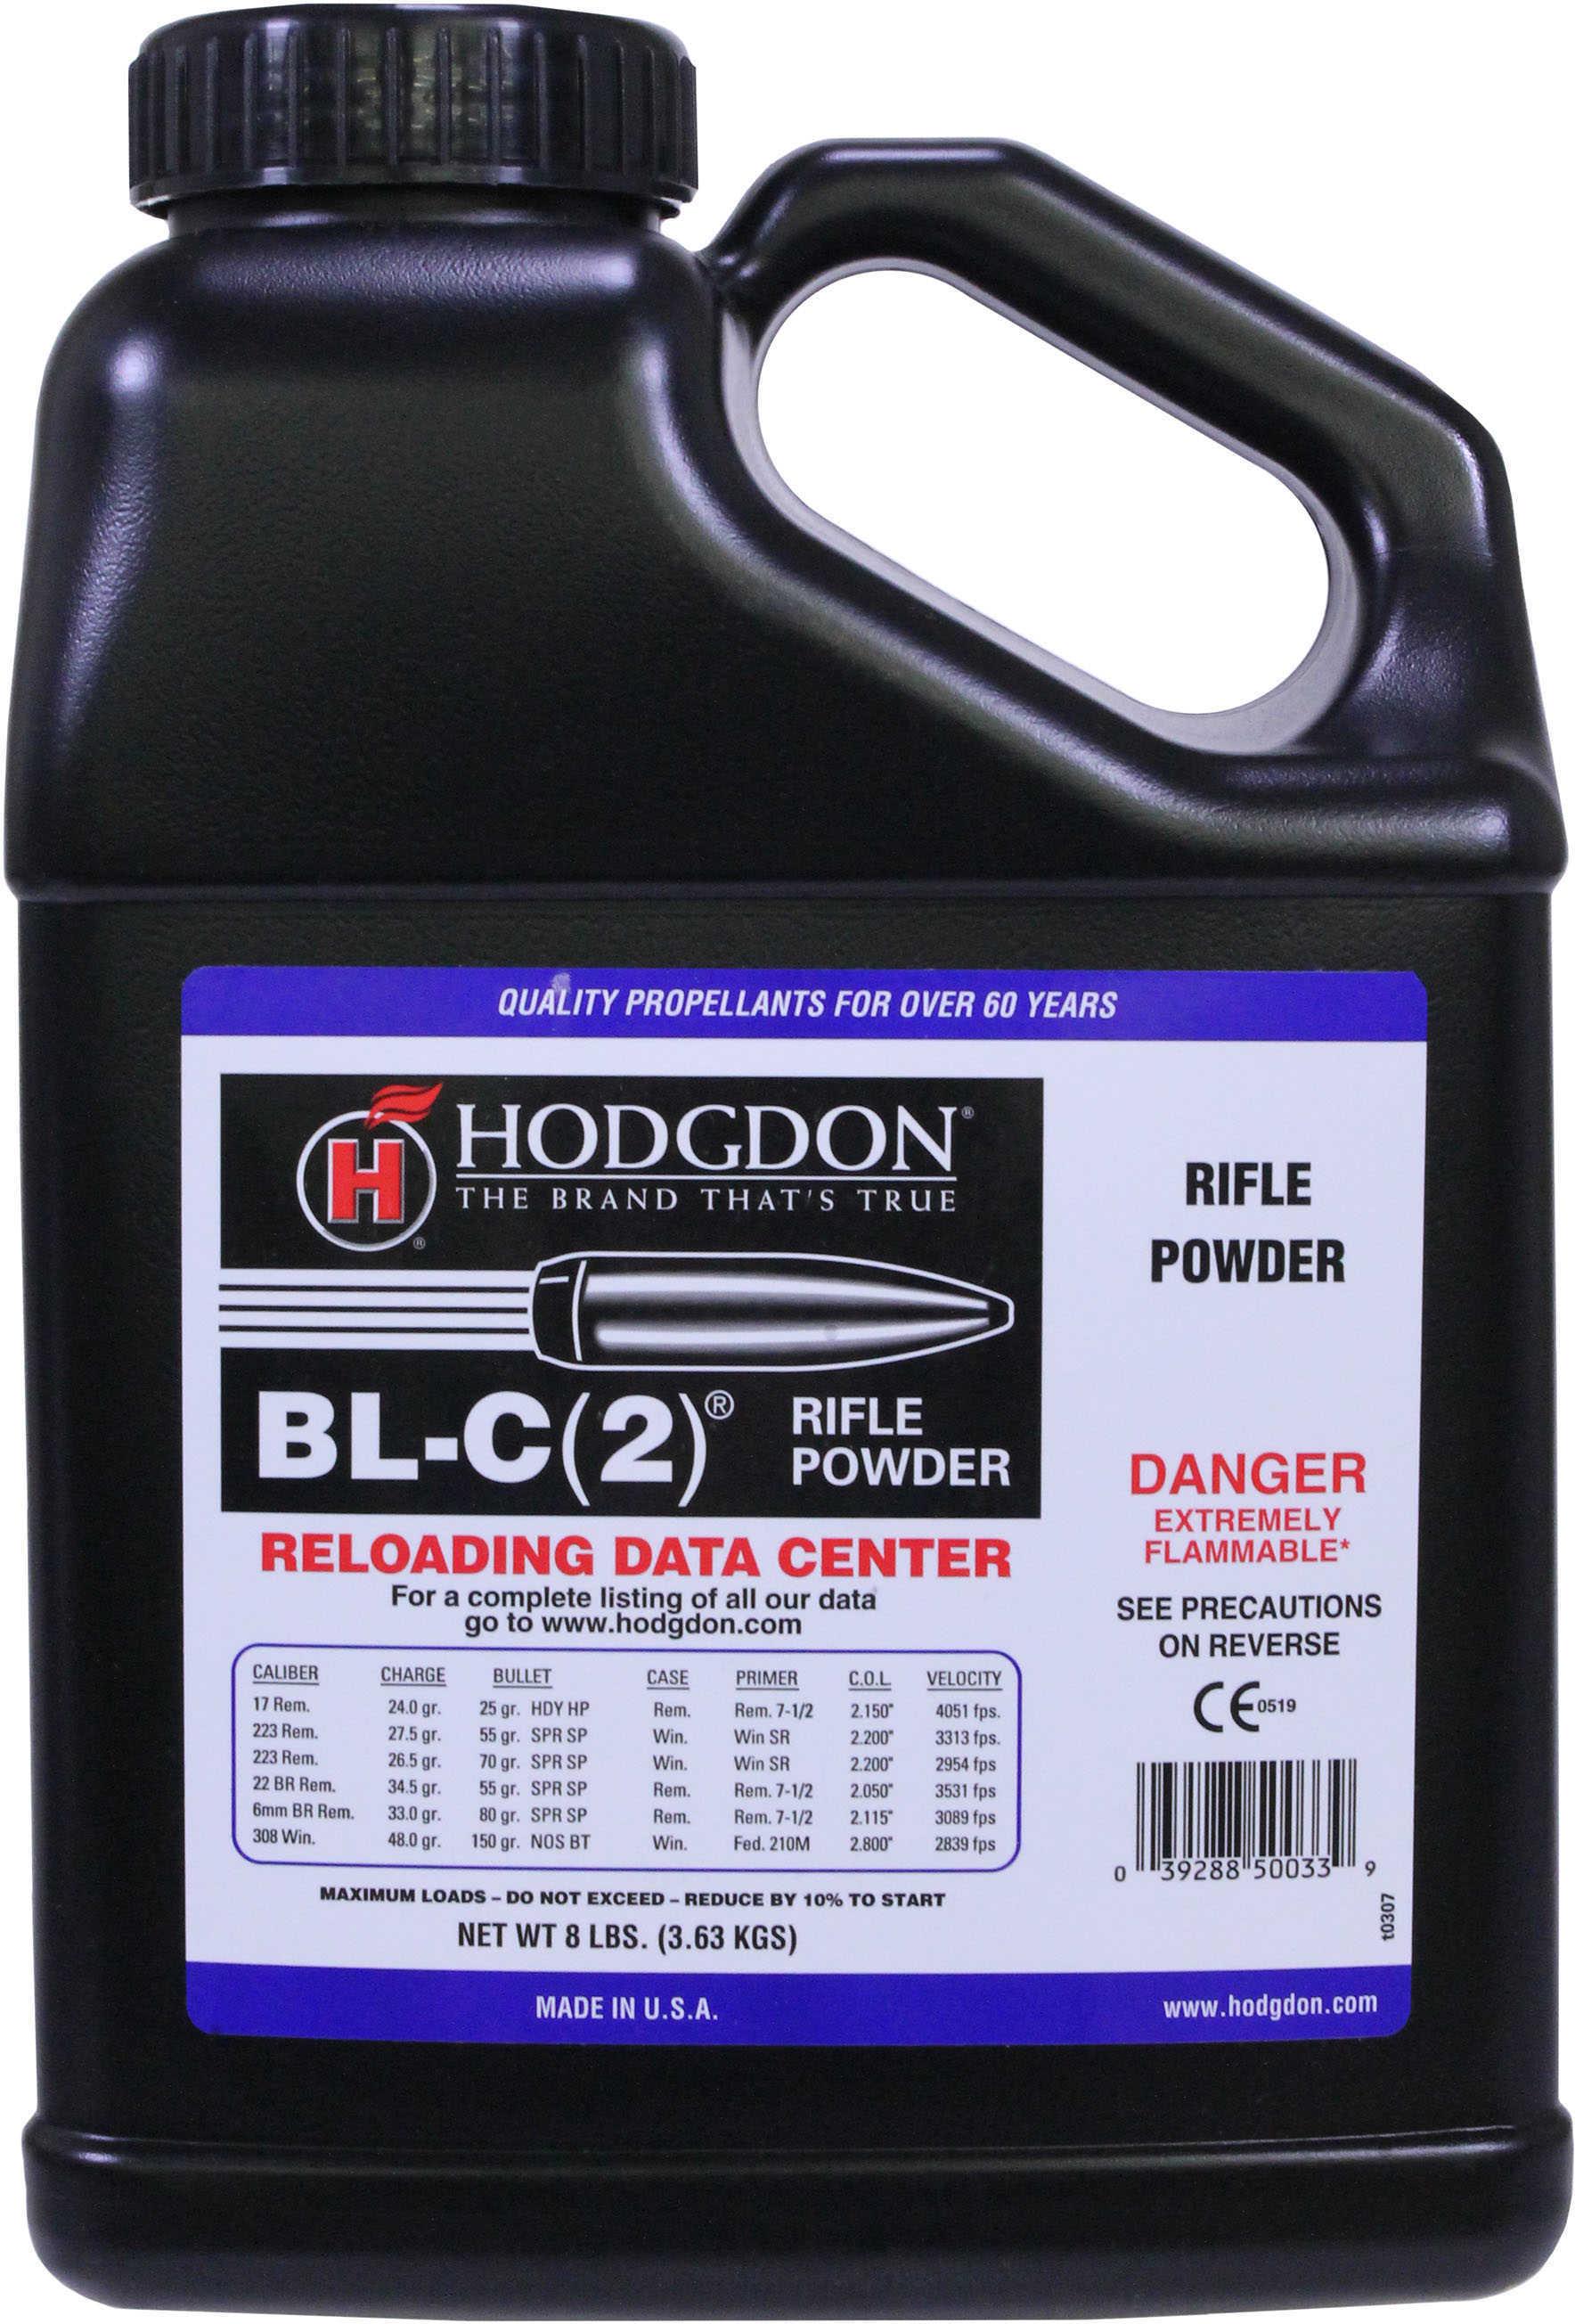 Hodgdon Powder Bl-C(2 Smokeless 8 Lb